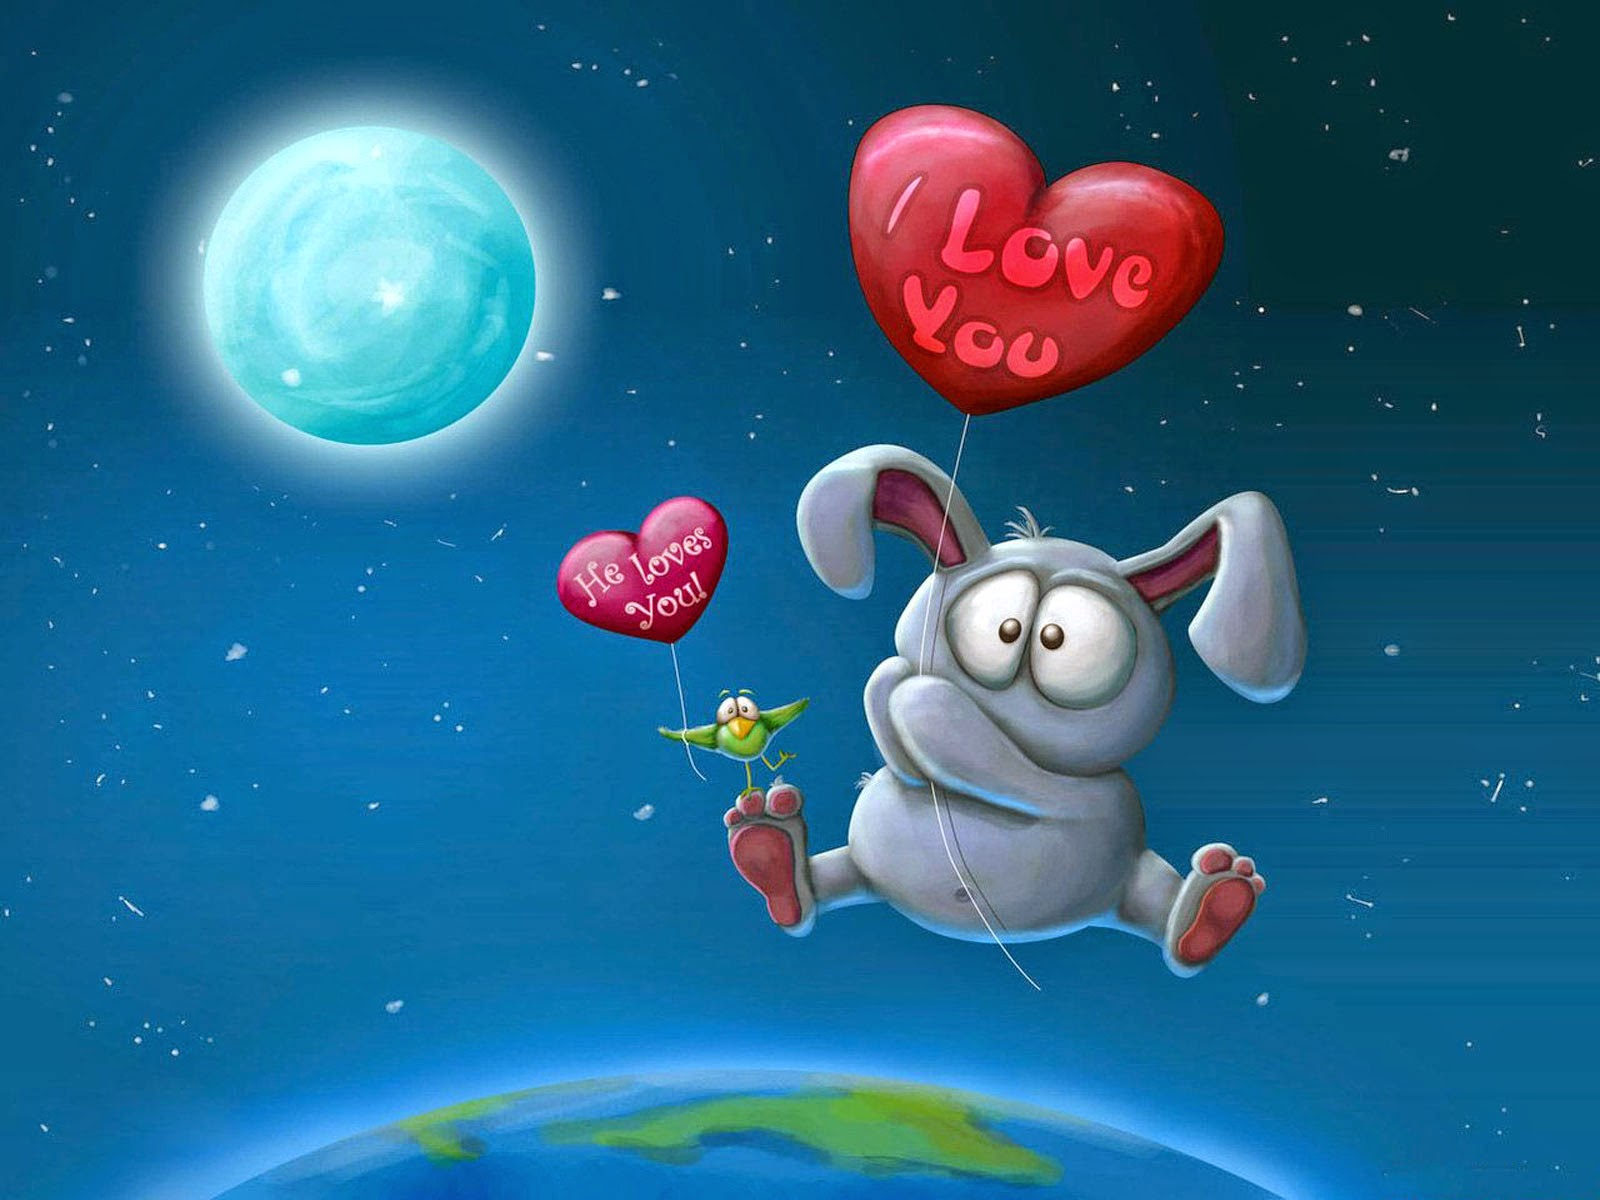 I love You Valentine 2015